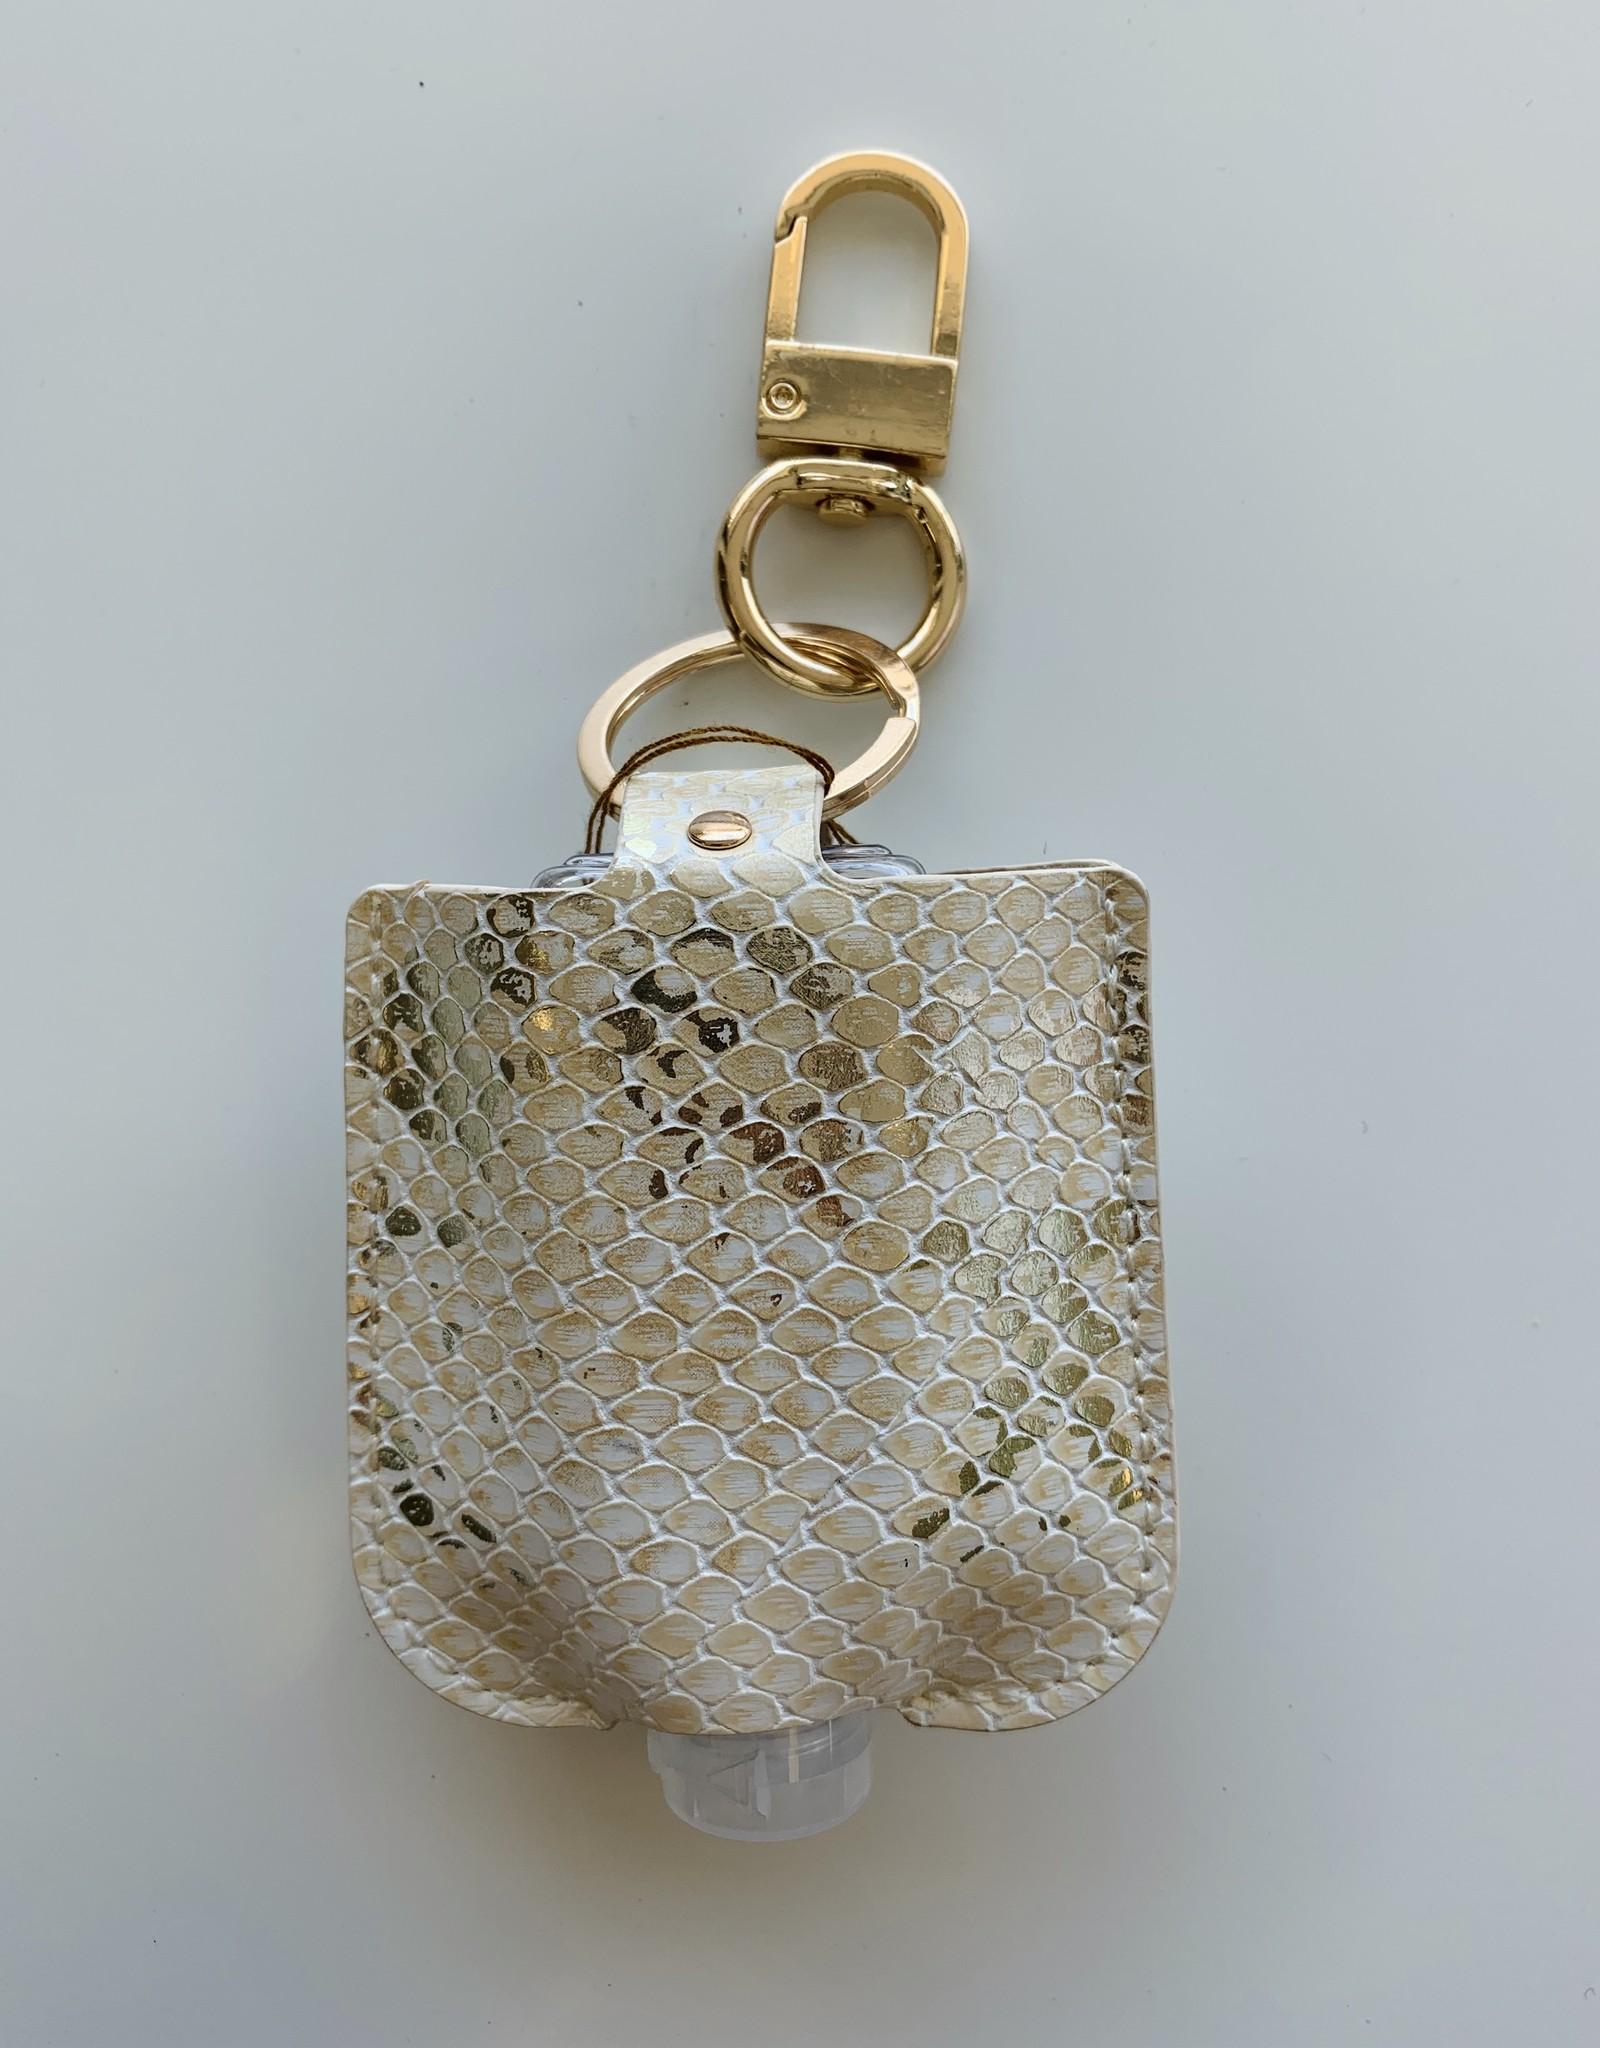 Keychain Sanitizer - Champagne/White Snakeskin